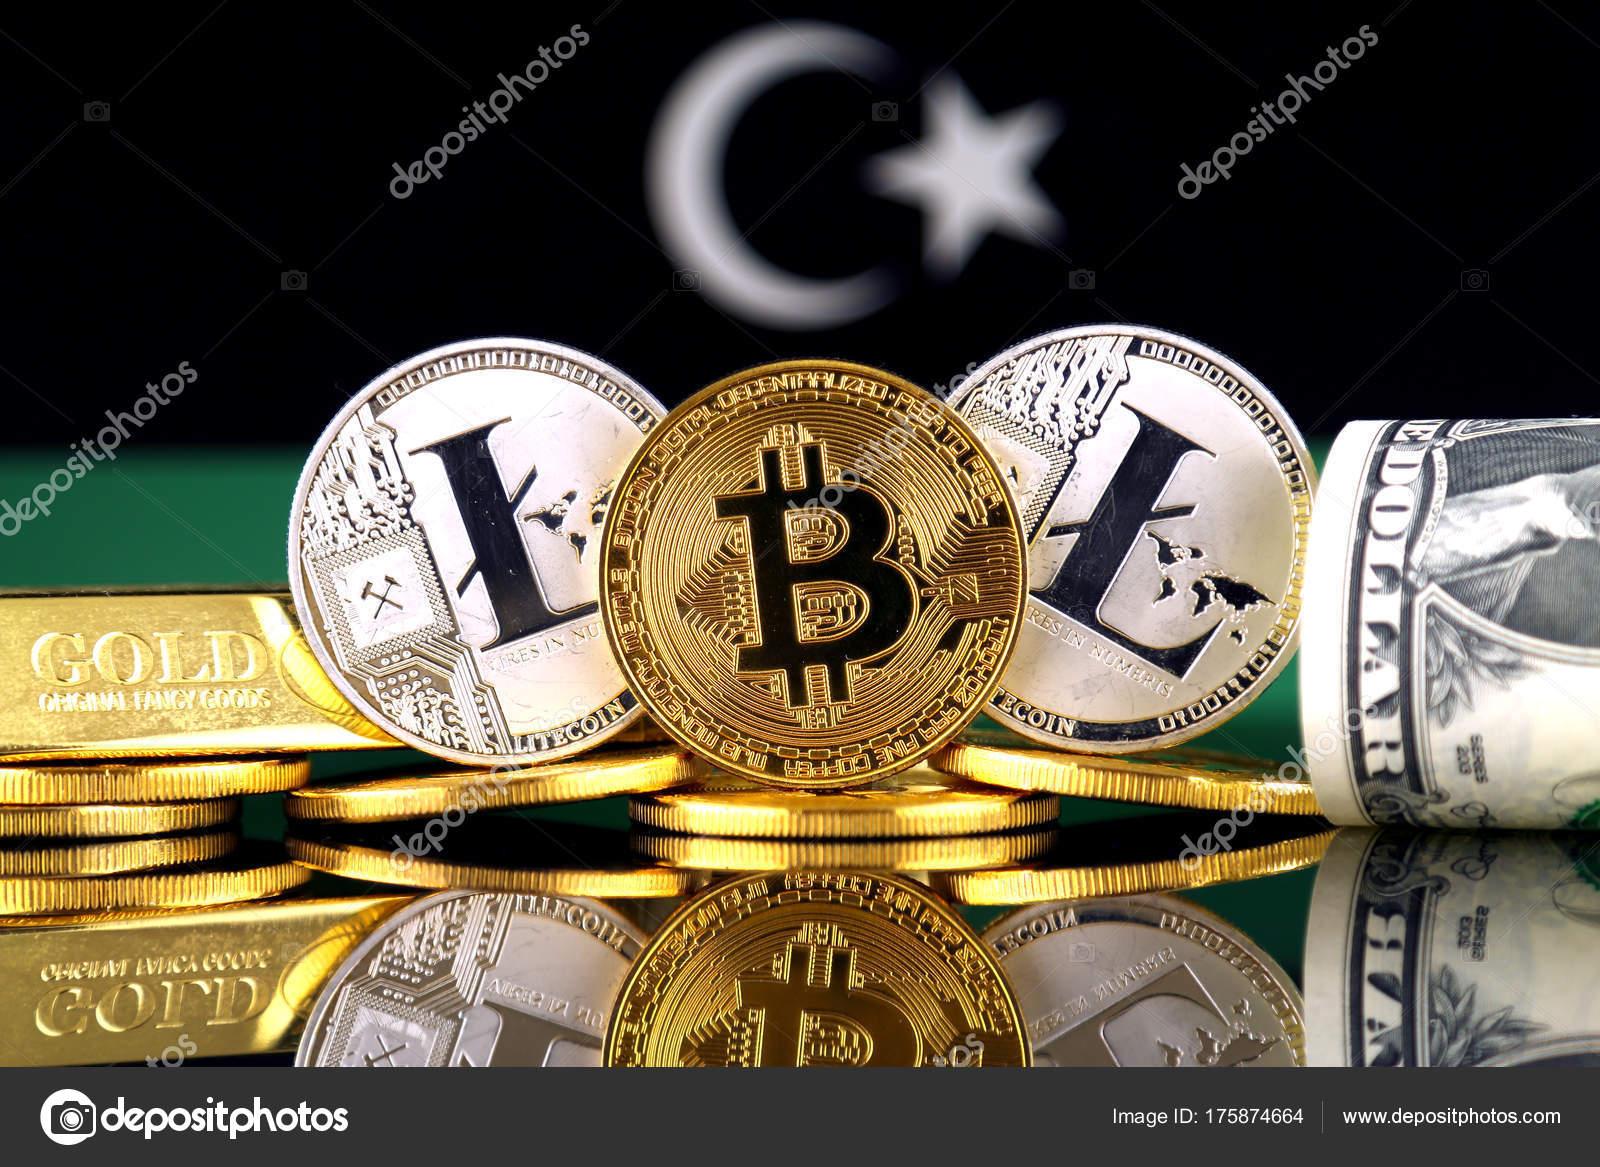 Physical version bitcoin litecoin gold dollar libya flag conceptual physical version bitcoin litecoin gold dollar libya flag conceptual image stock photo ccuart Choice Image